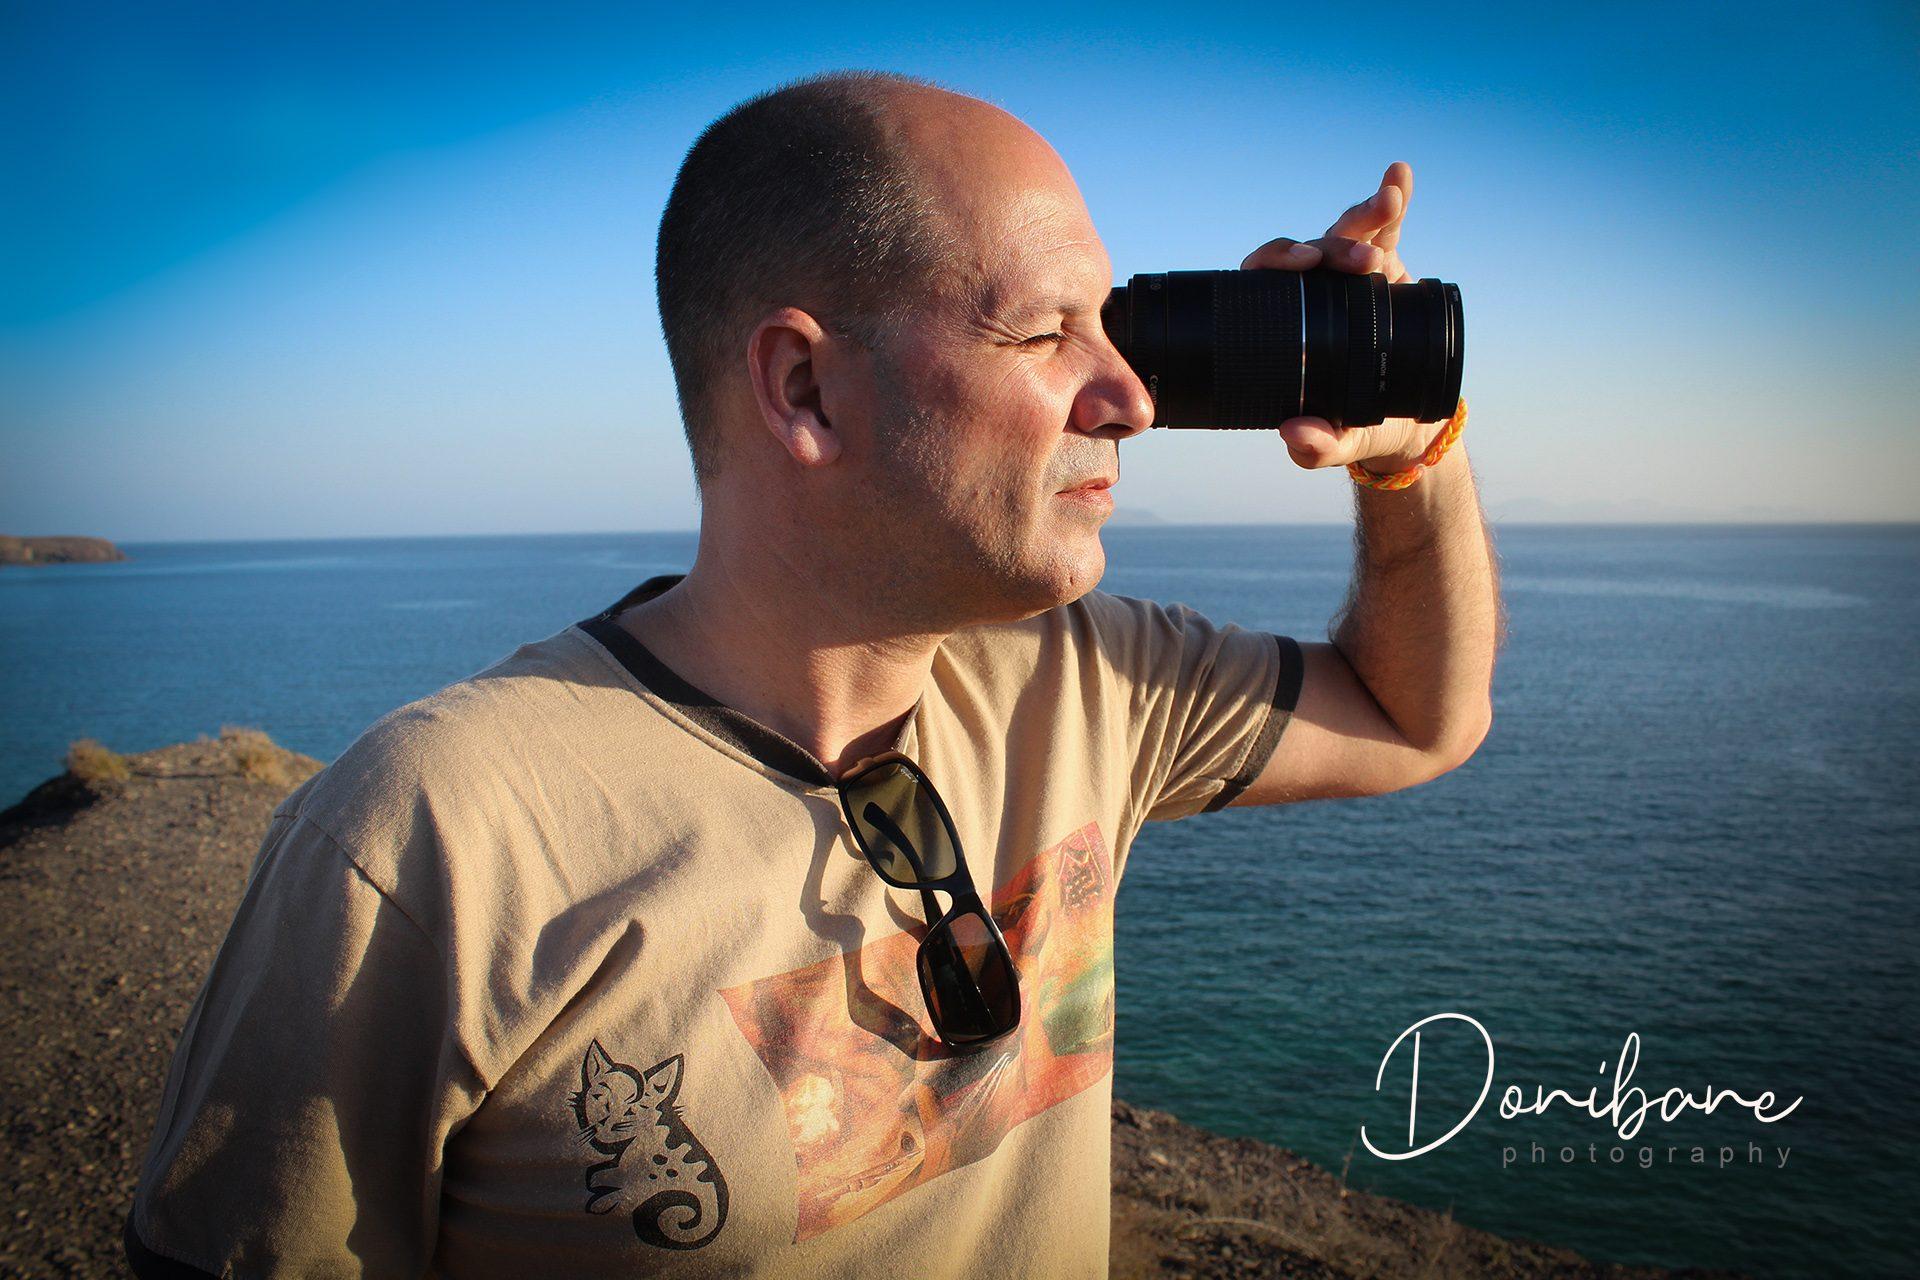 Donibane fotografo para turismo